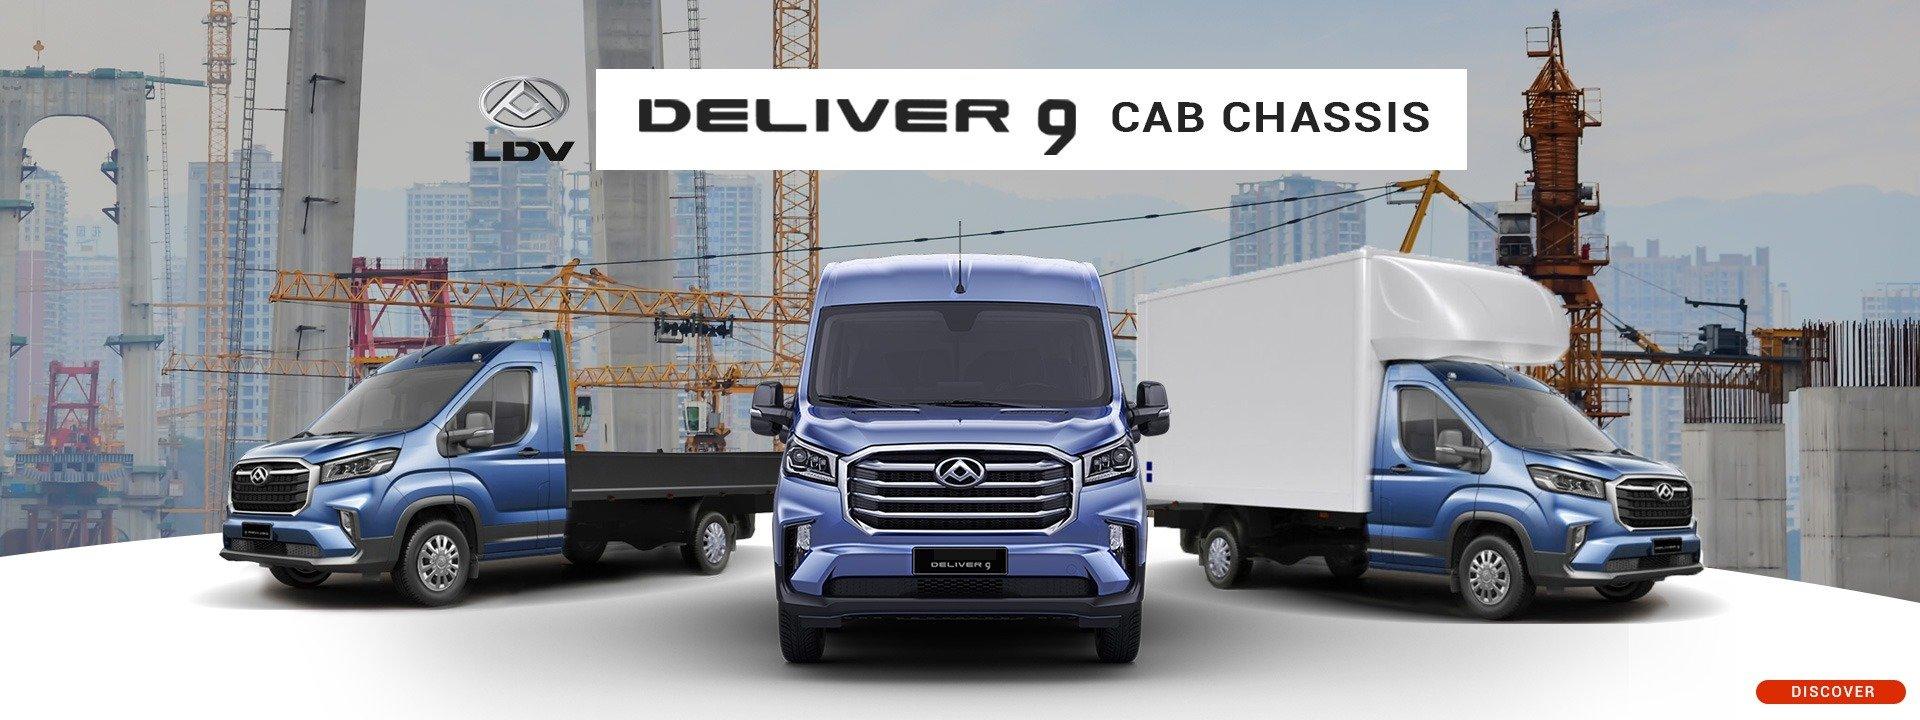 ldv_cab_chassis